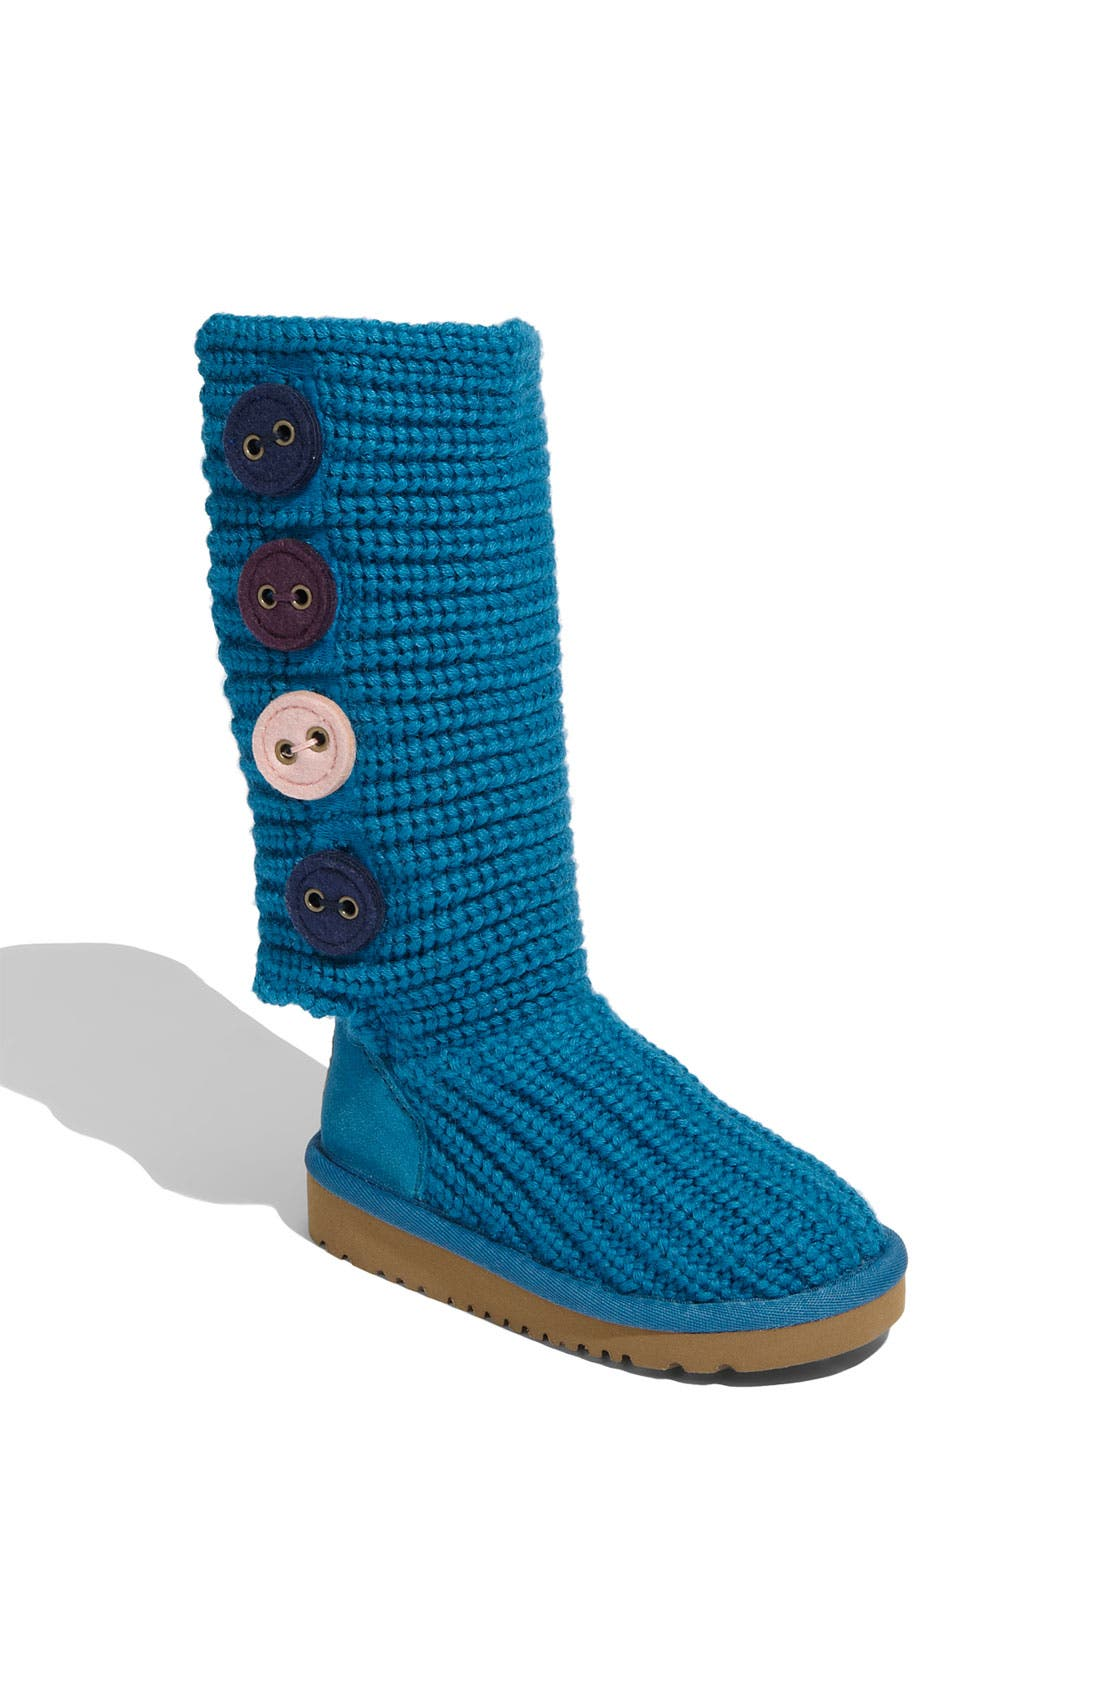 Alternate Image 1 Selected - UGG® Australia 'Cardy II' Crochet Boot (Toddler, Little Kid & Big Kid)